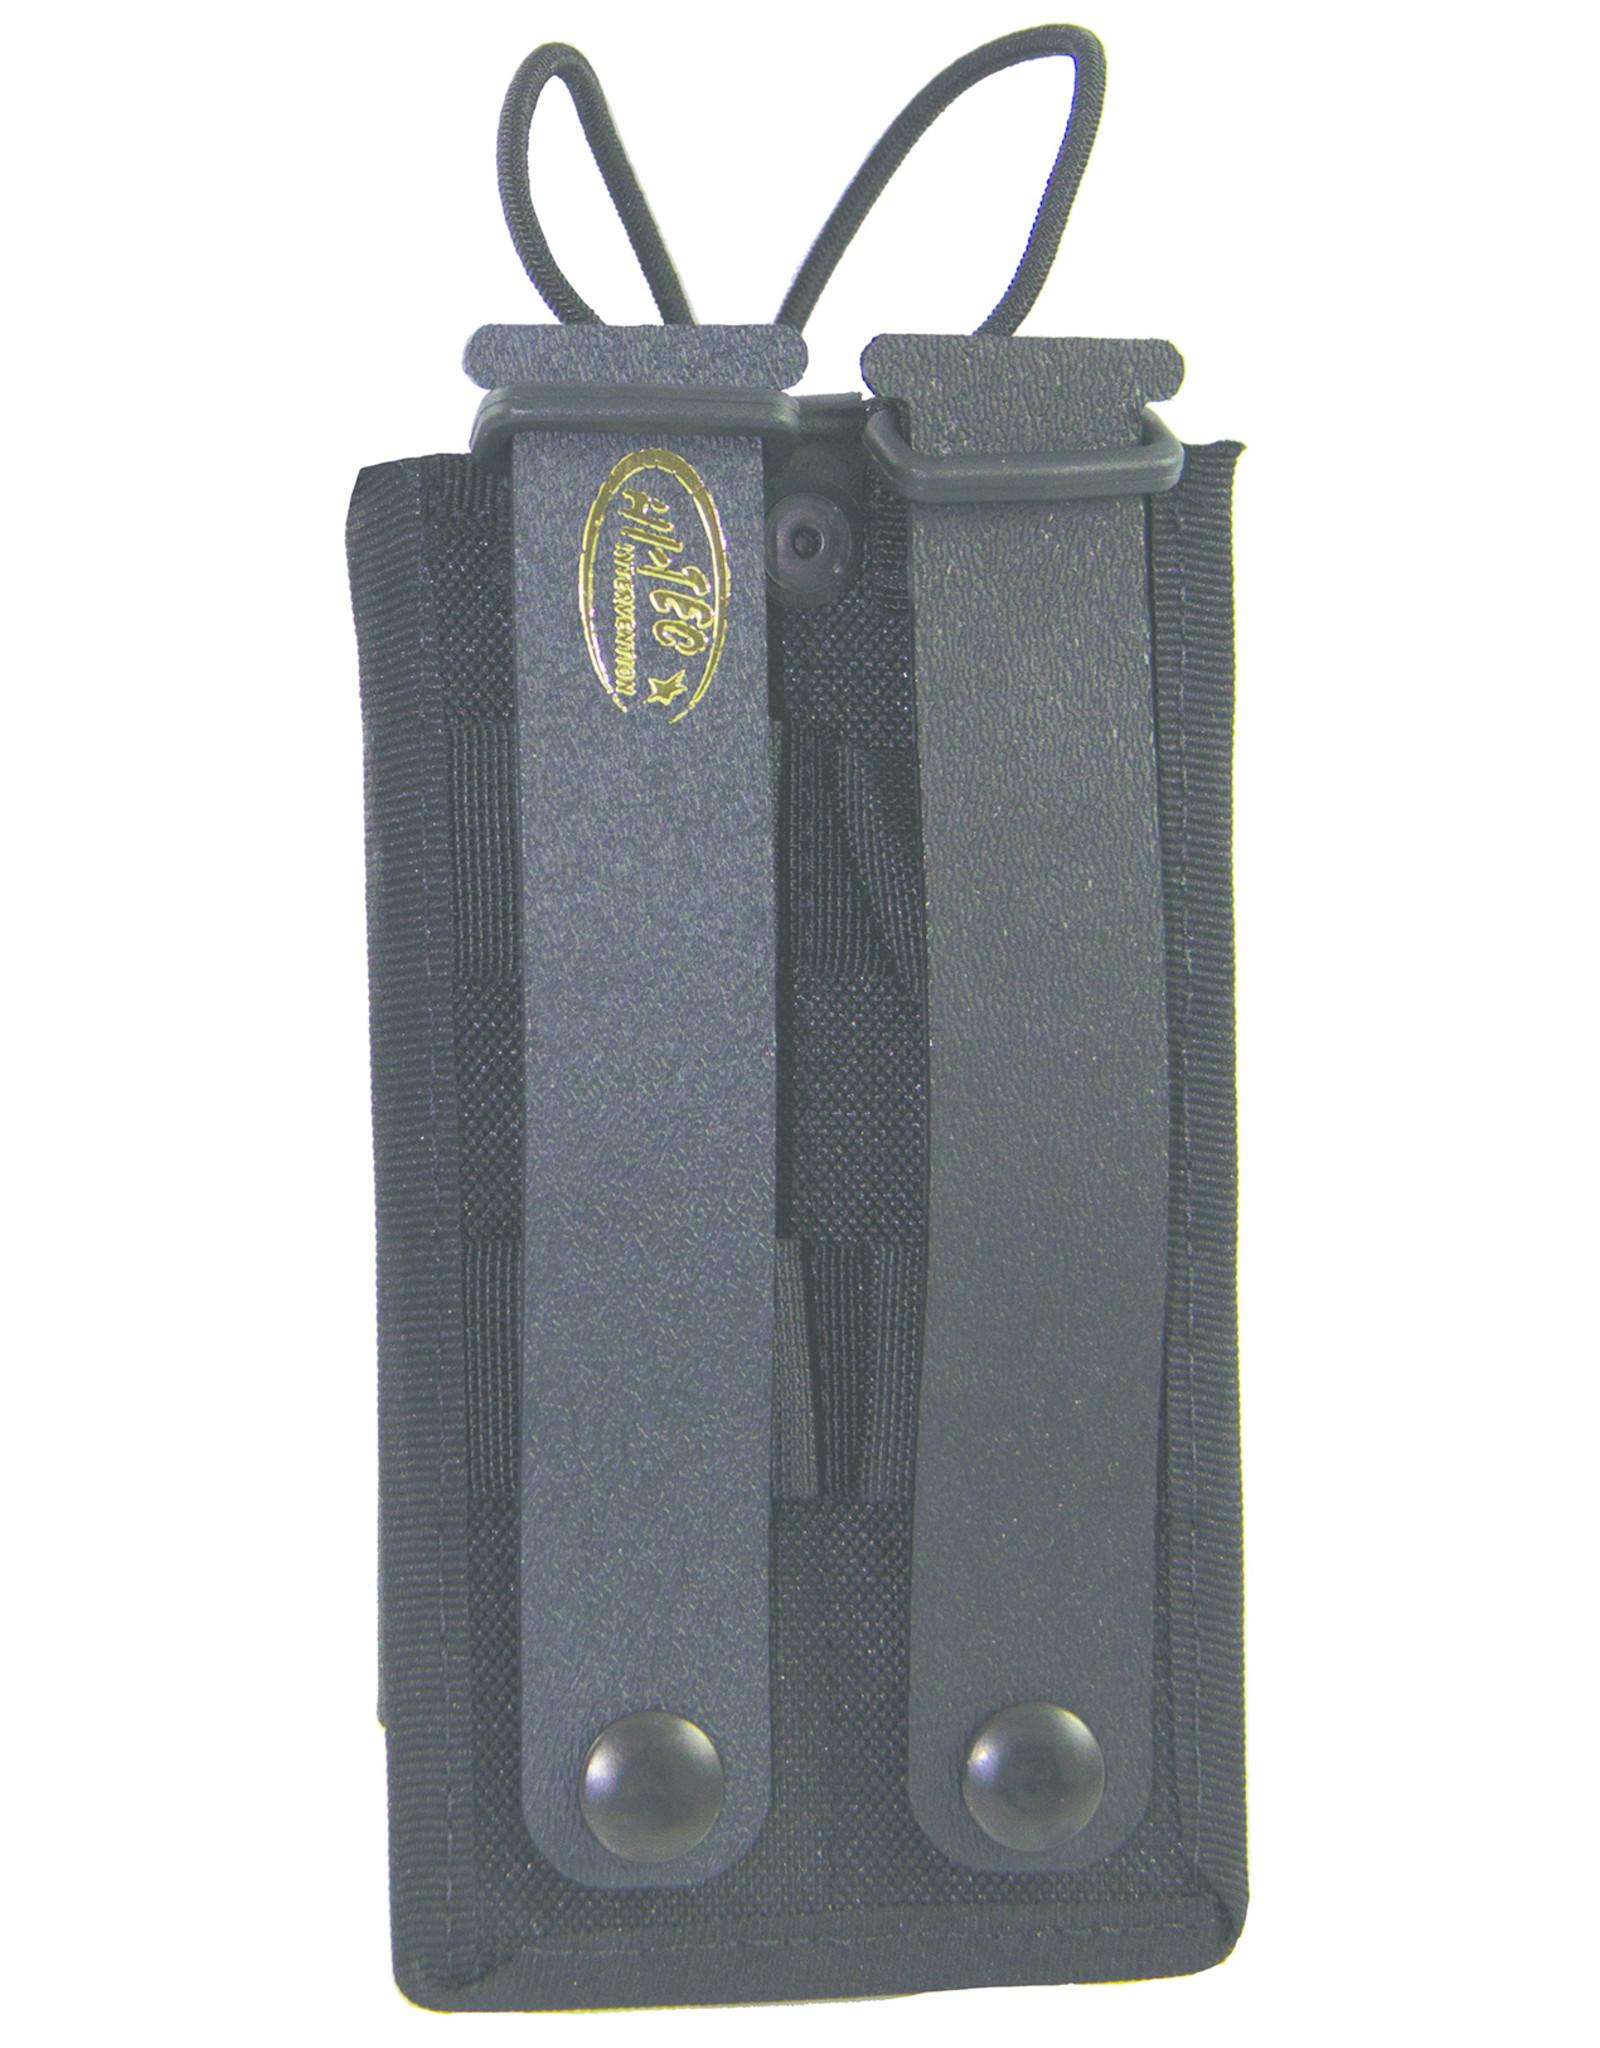 HI-TEC INTERVENTION LOC-Stick Universal Radio Case - HT5086